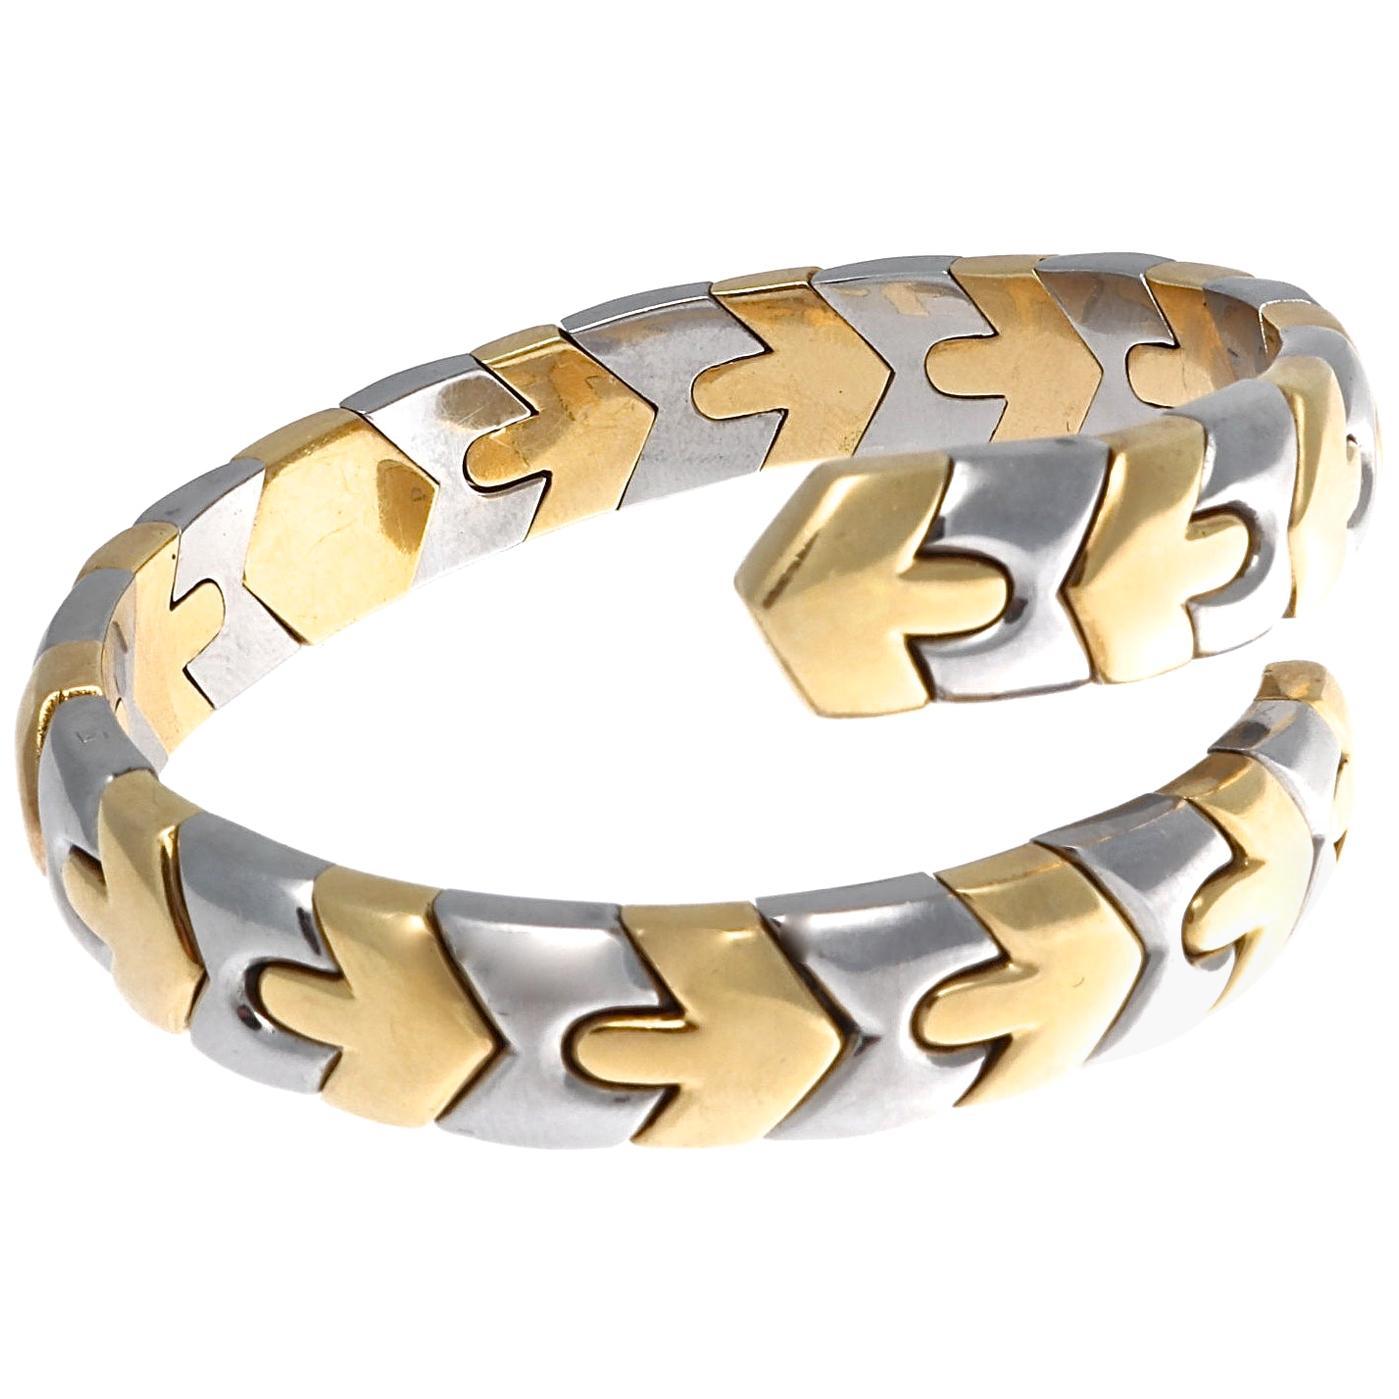 Fine Jewelry and Estate Jewelry at 1stdibs